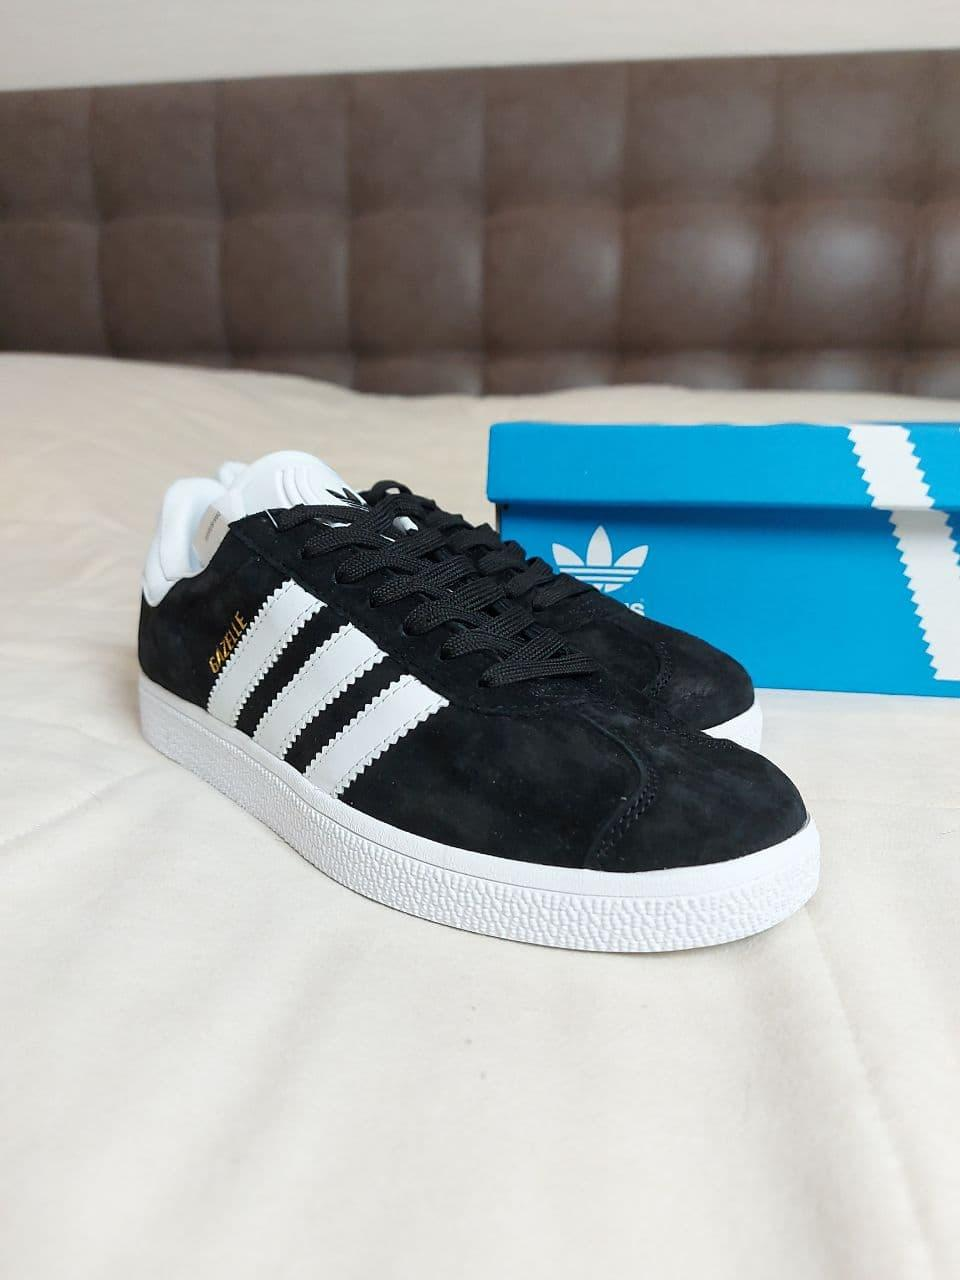 Adidas Gazelle black  адидас газели | кроссовки мужские кеды кеди